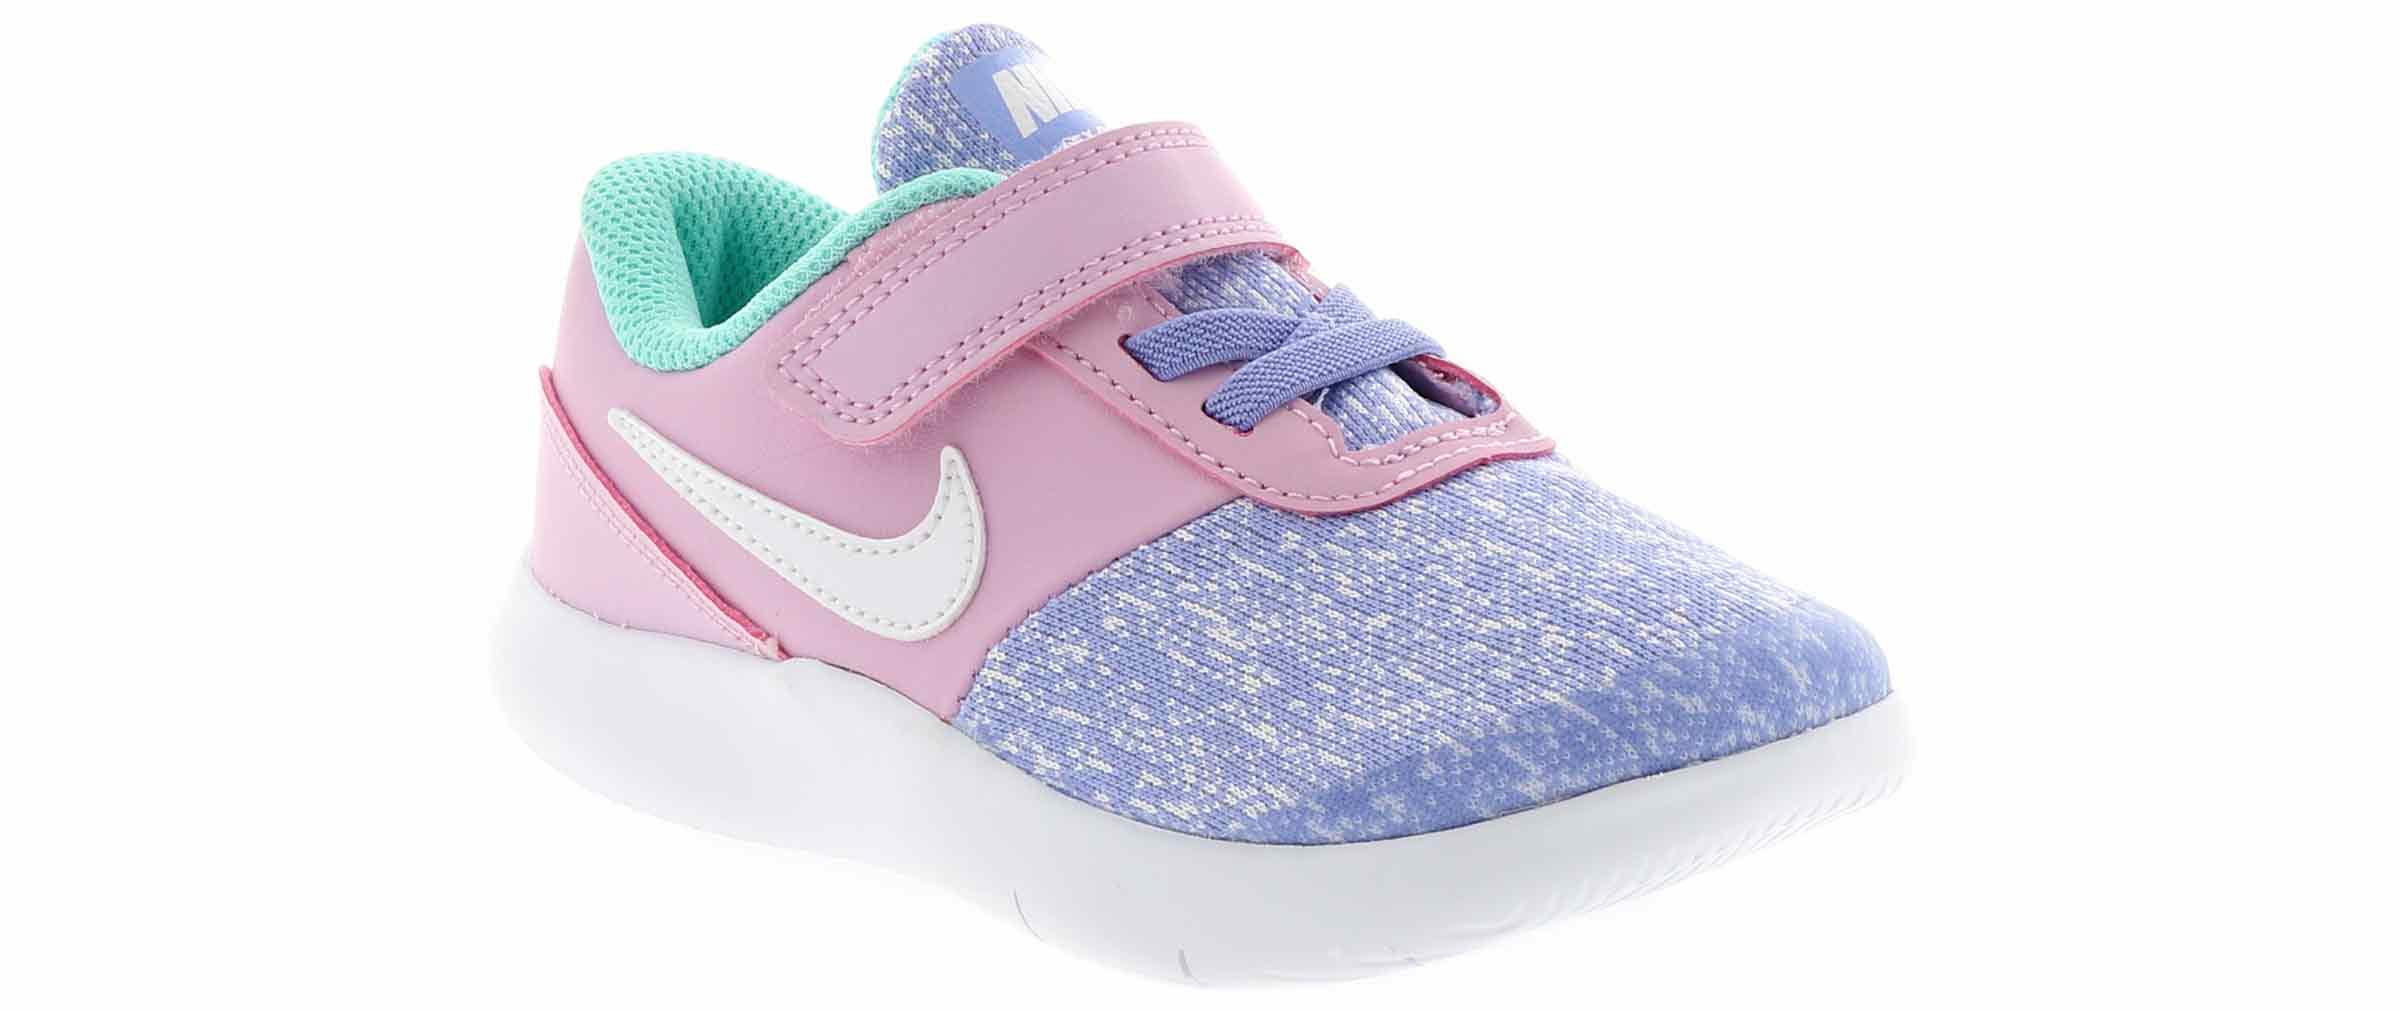 Toddler Slip On Shoes innovatis-suisse.ch